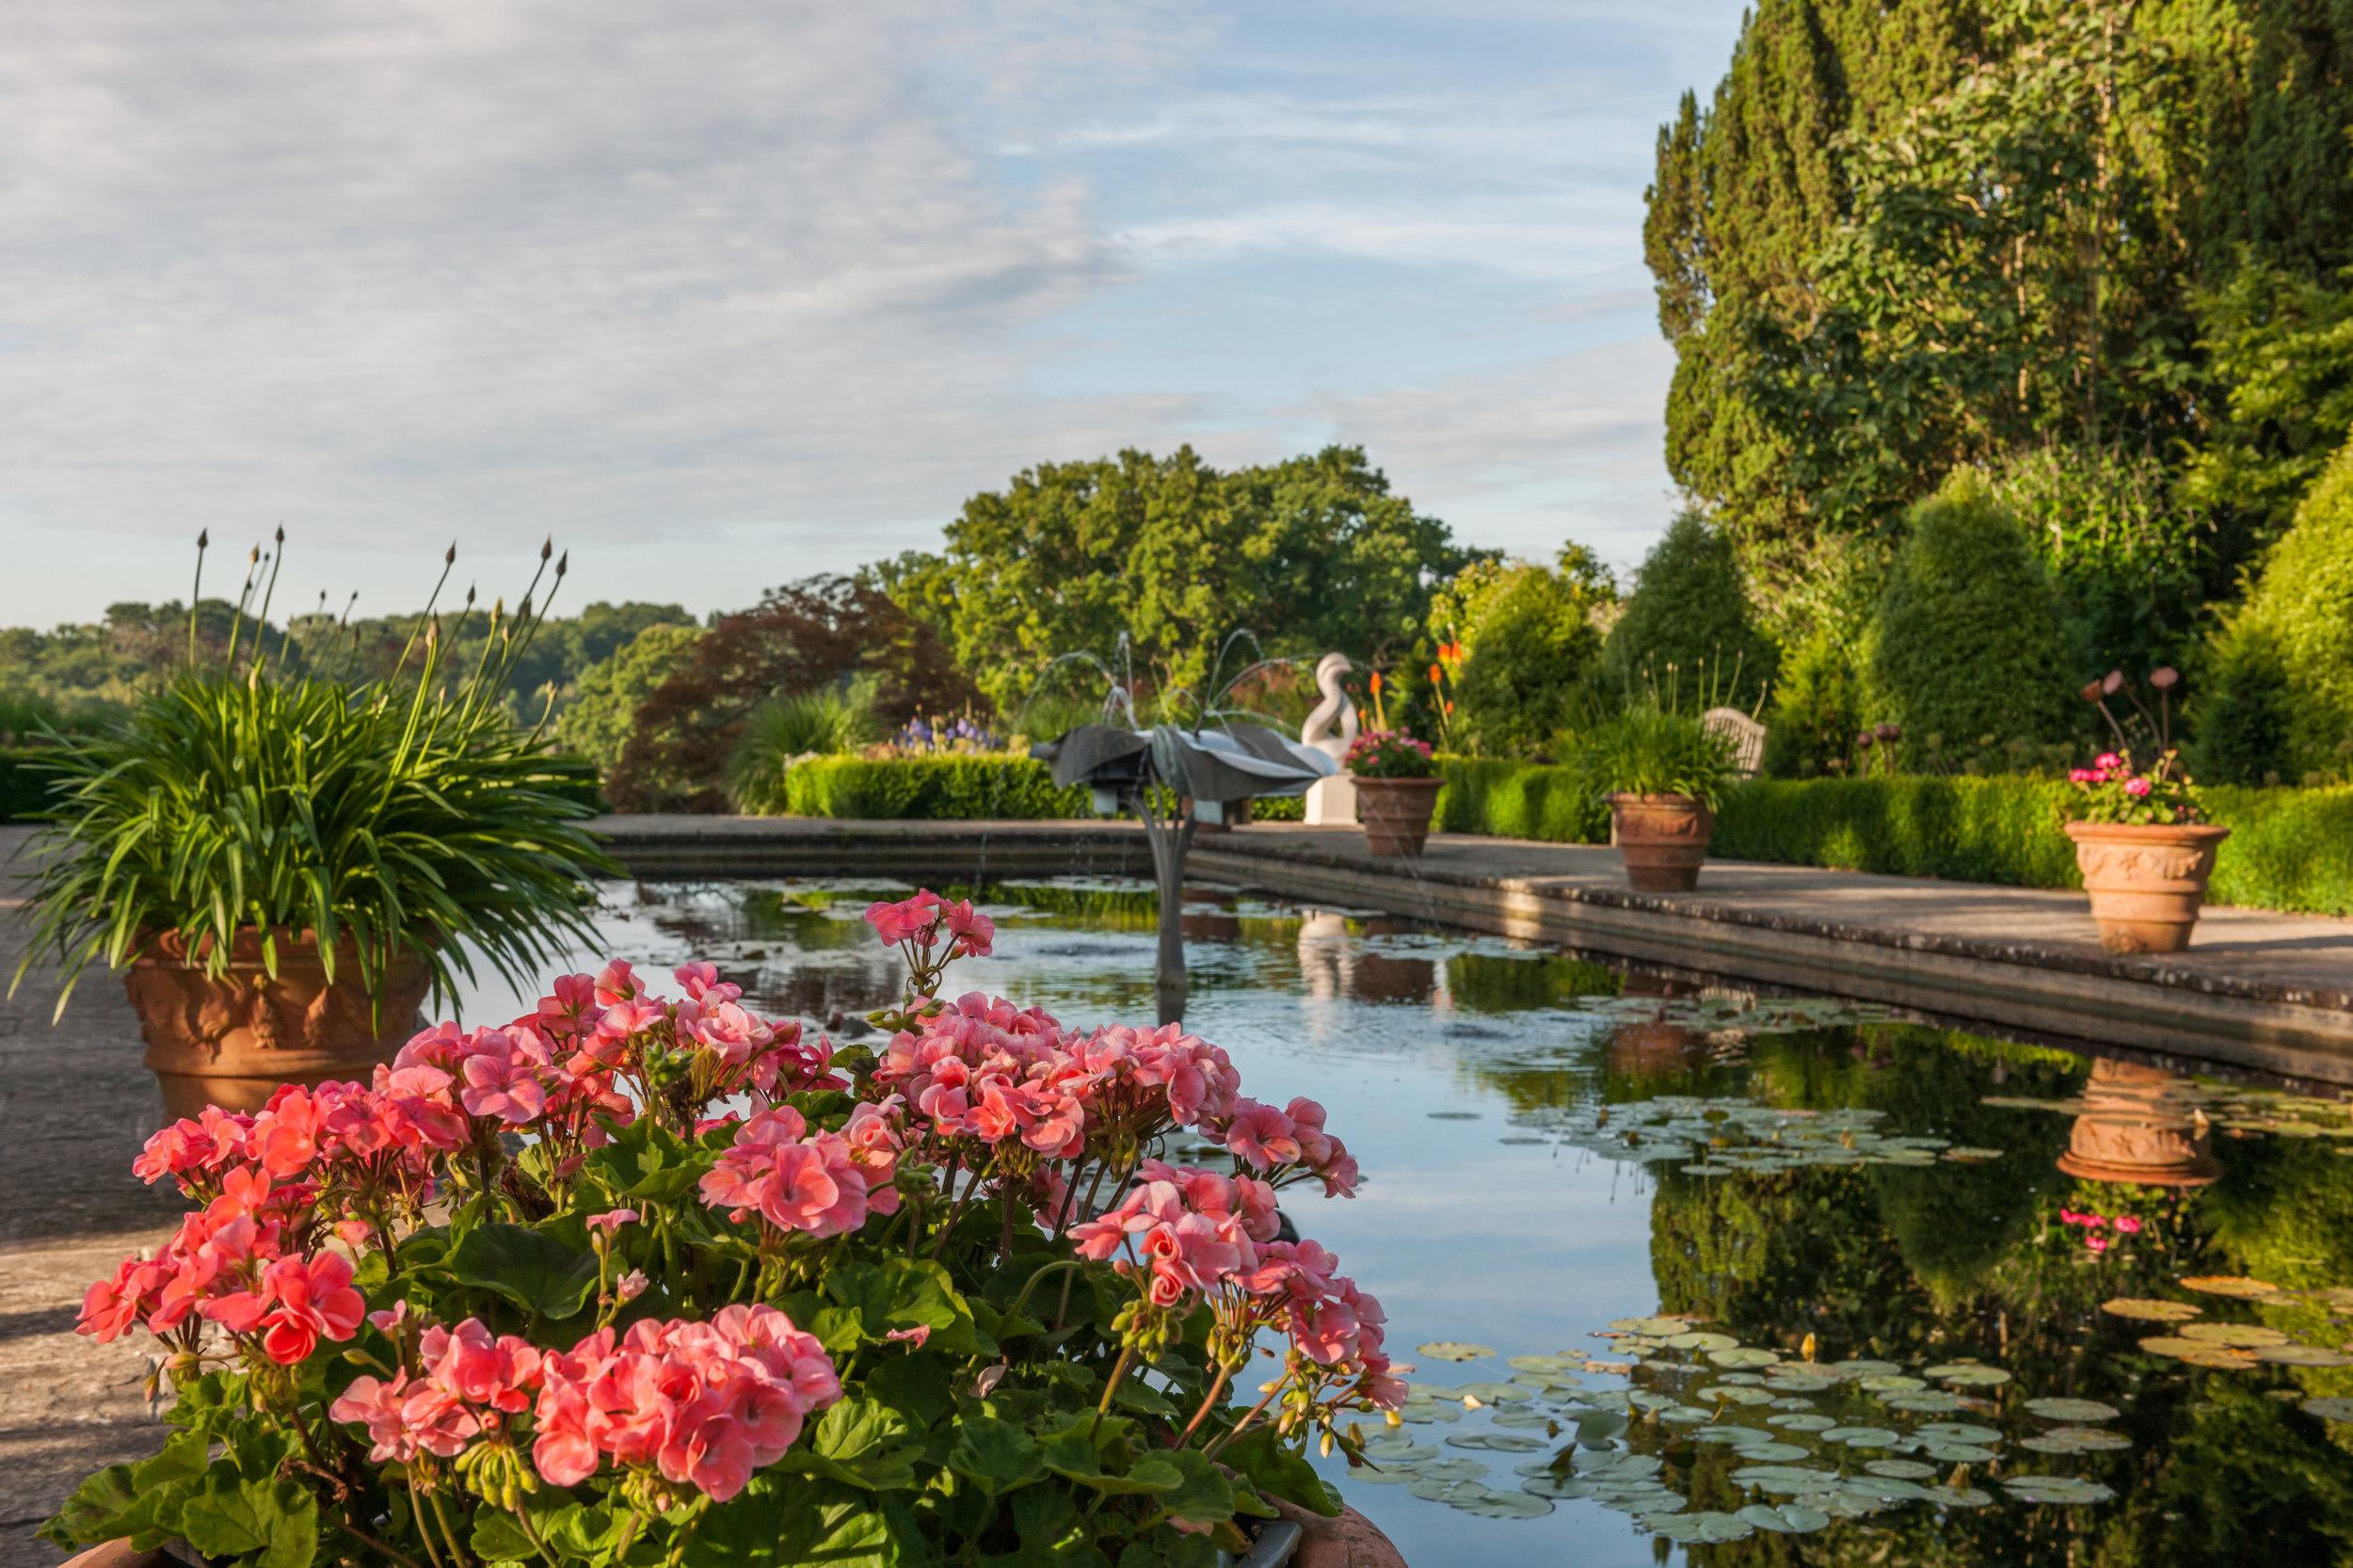 Borde Hill Garden gpond1096 formal pond J Glover.jpg